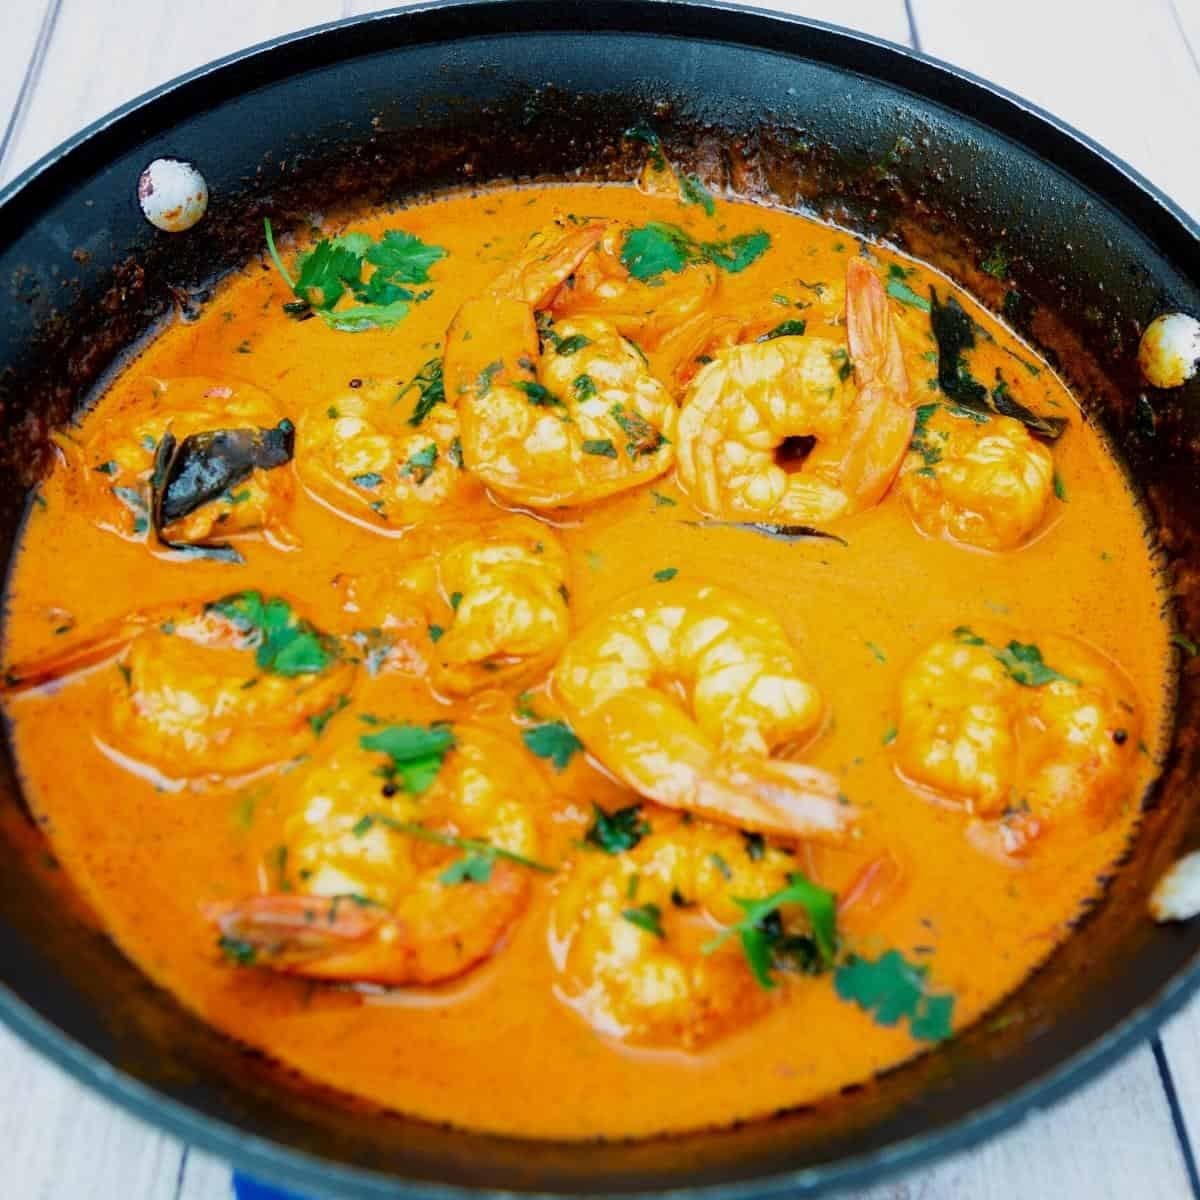 Skillet with prawn shrimp curry.